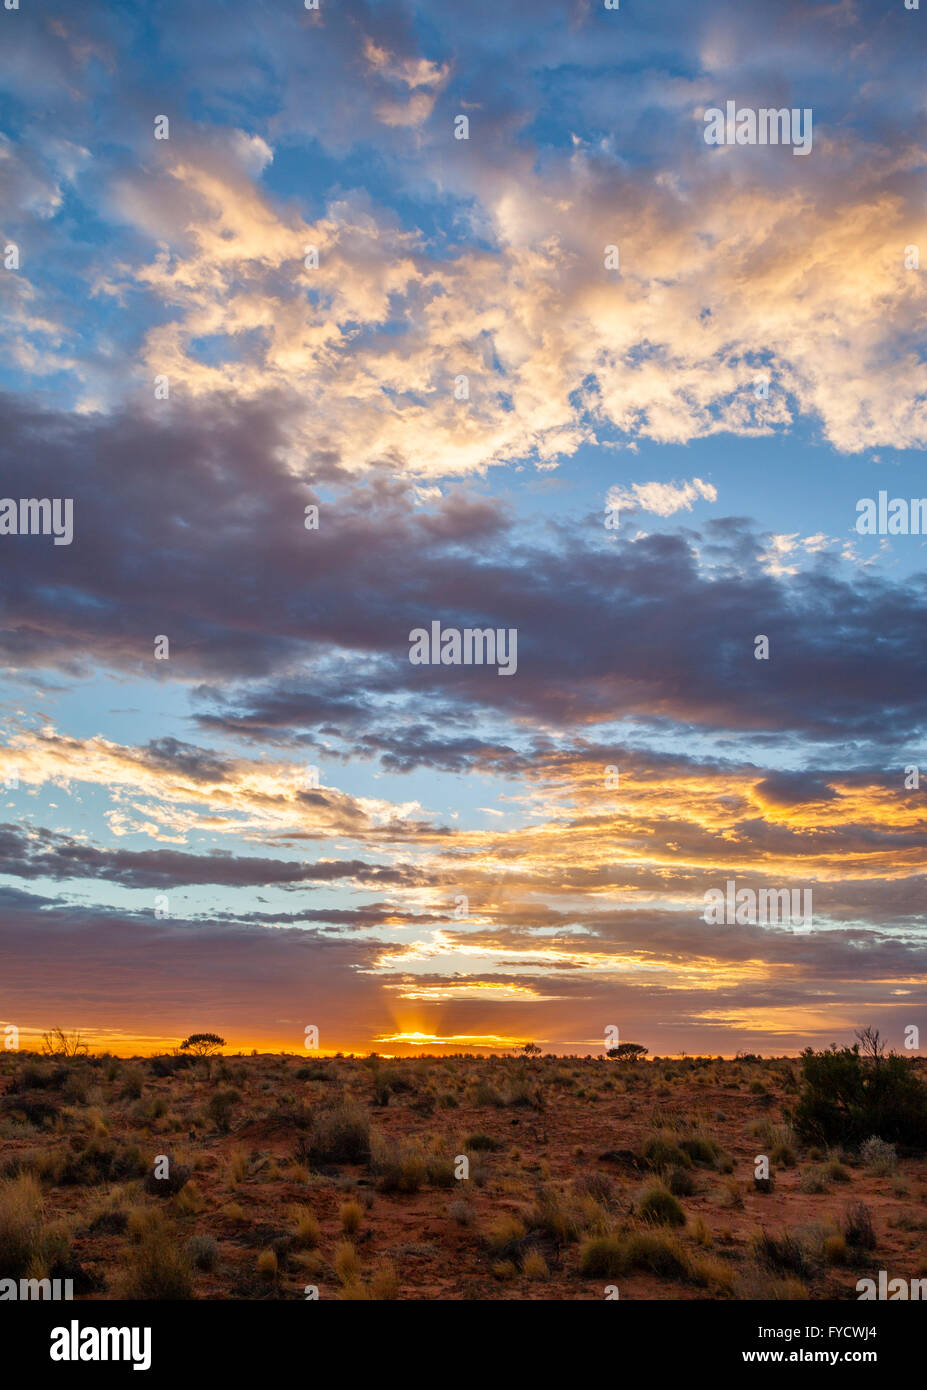 pre-sunrise glow over the Simpson Desert at Purni Bore, Witjira National Park, South Australia - Stock Image